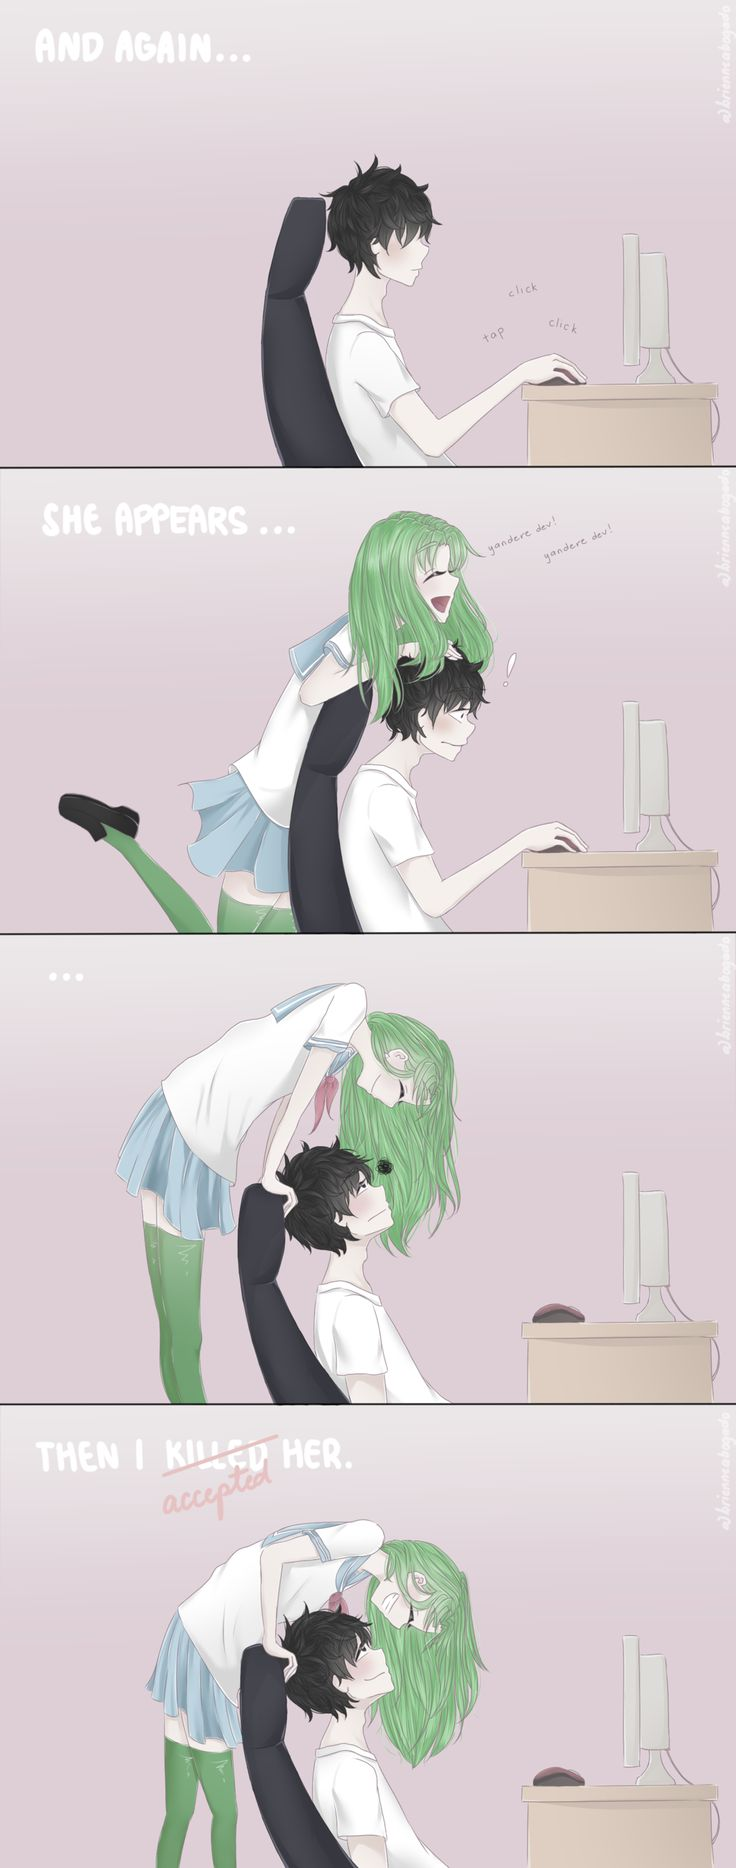 Game development blog yandere classmates anime pinterest nice - Yandere Dev And Midori Gurin